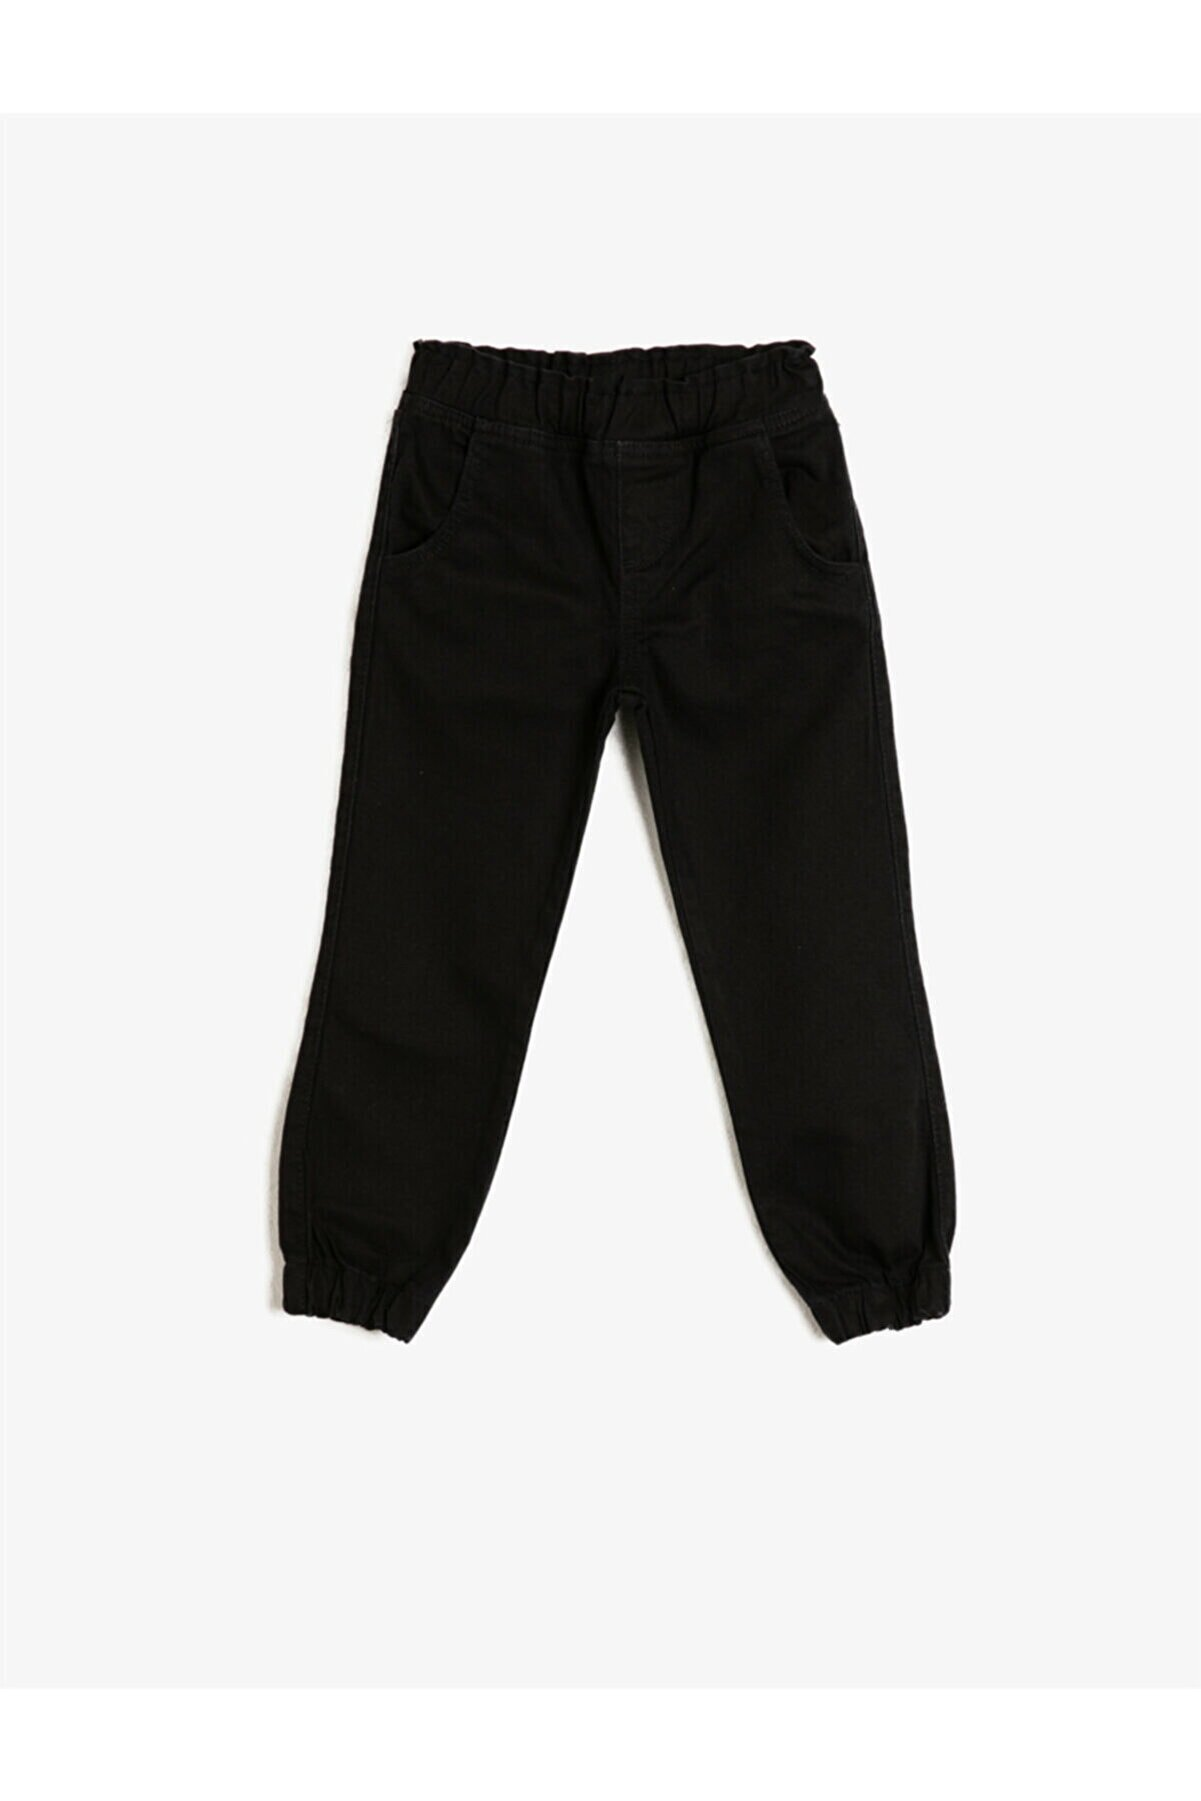 Koton Erkek Çocuk Siyah Normal Bel Pamuklu Jean Pantolon